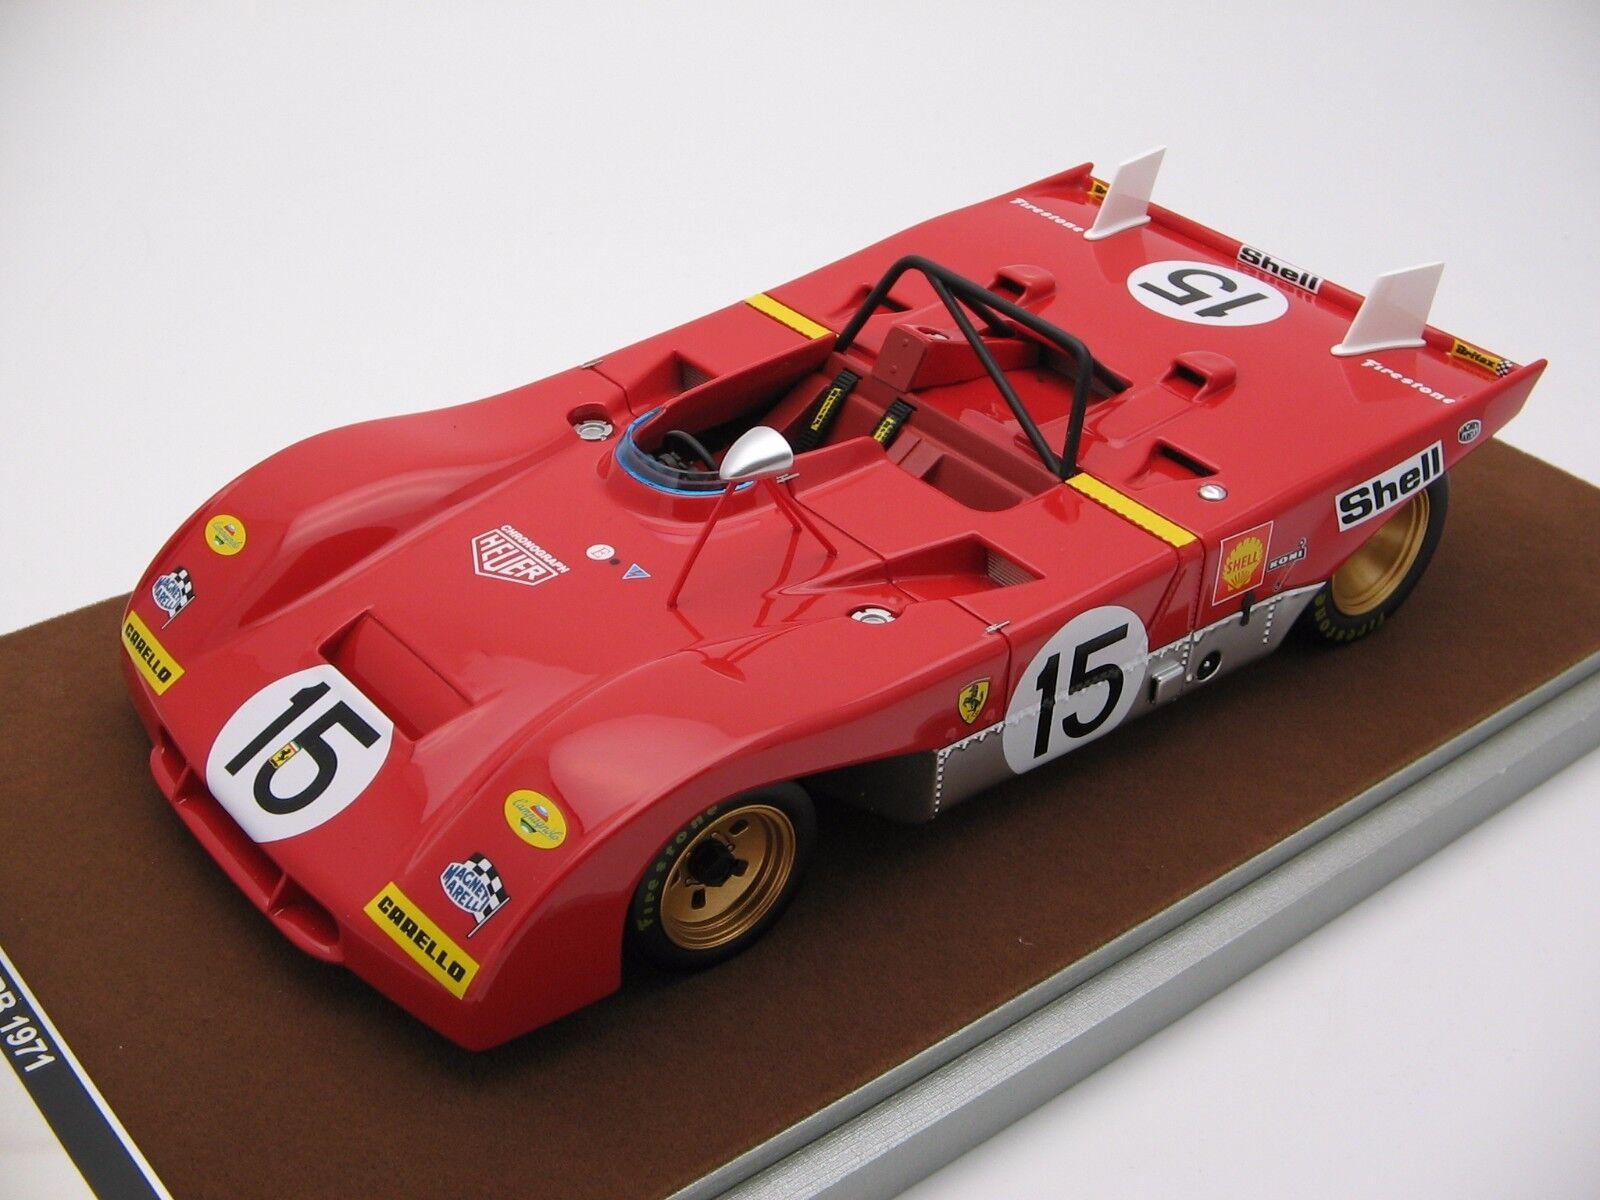 1 18 Scale Tecnomodel Ferrari 312pb Monza 1000 KMS 1971 tm18-61c